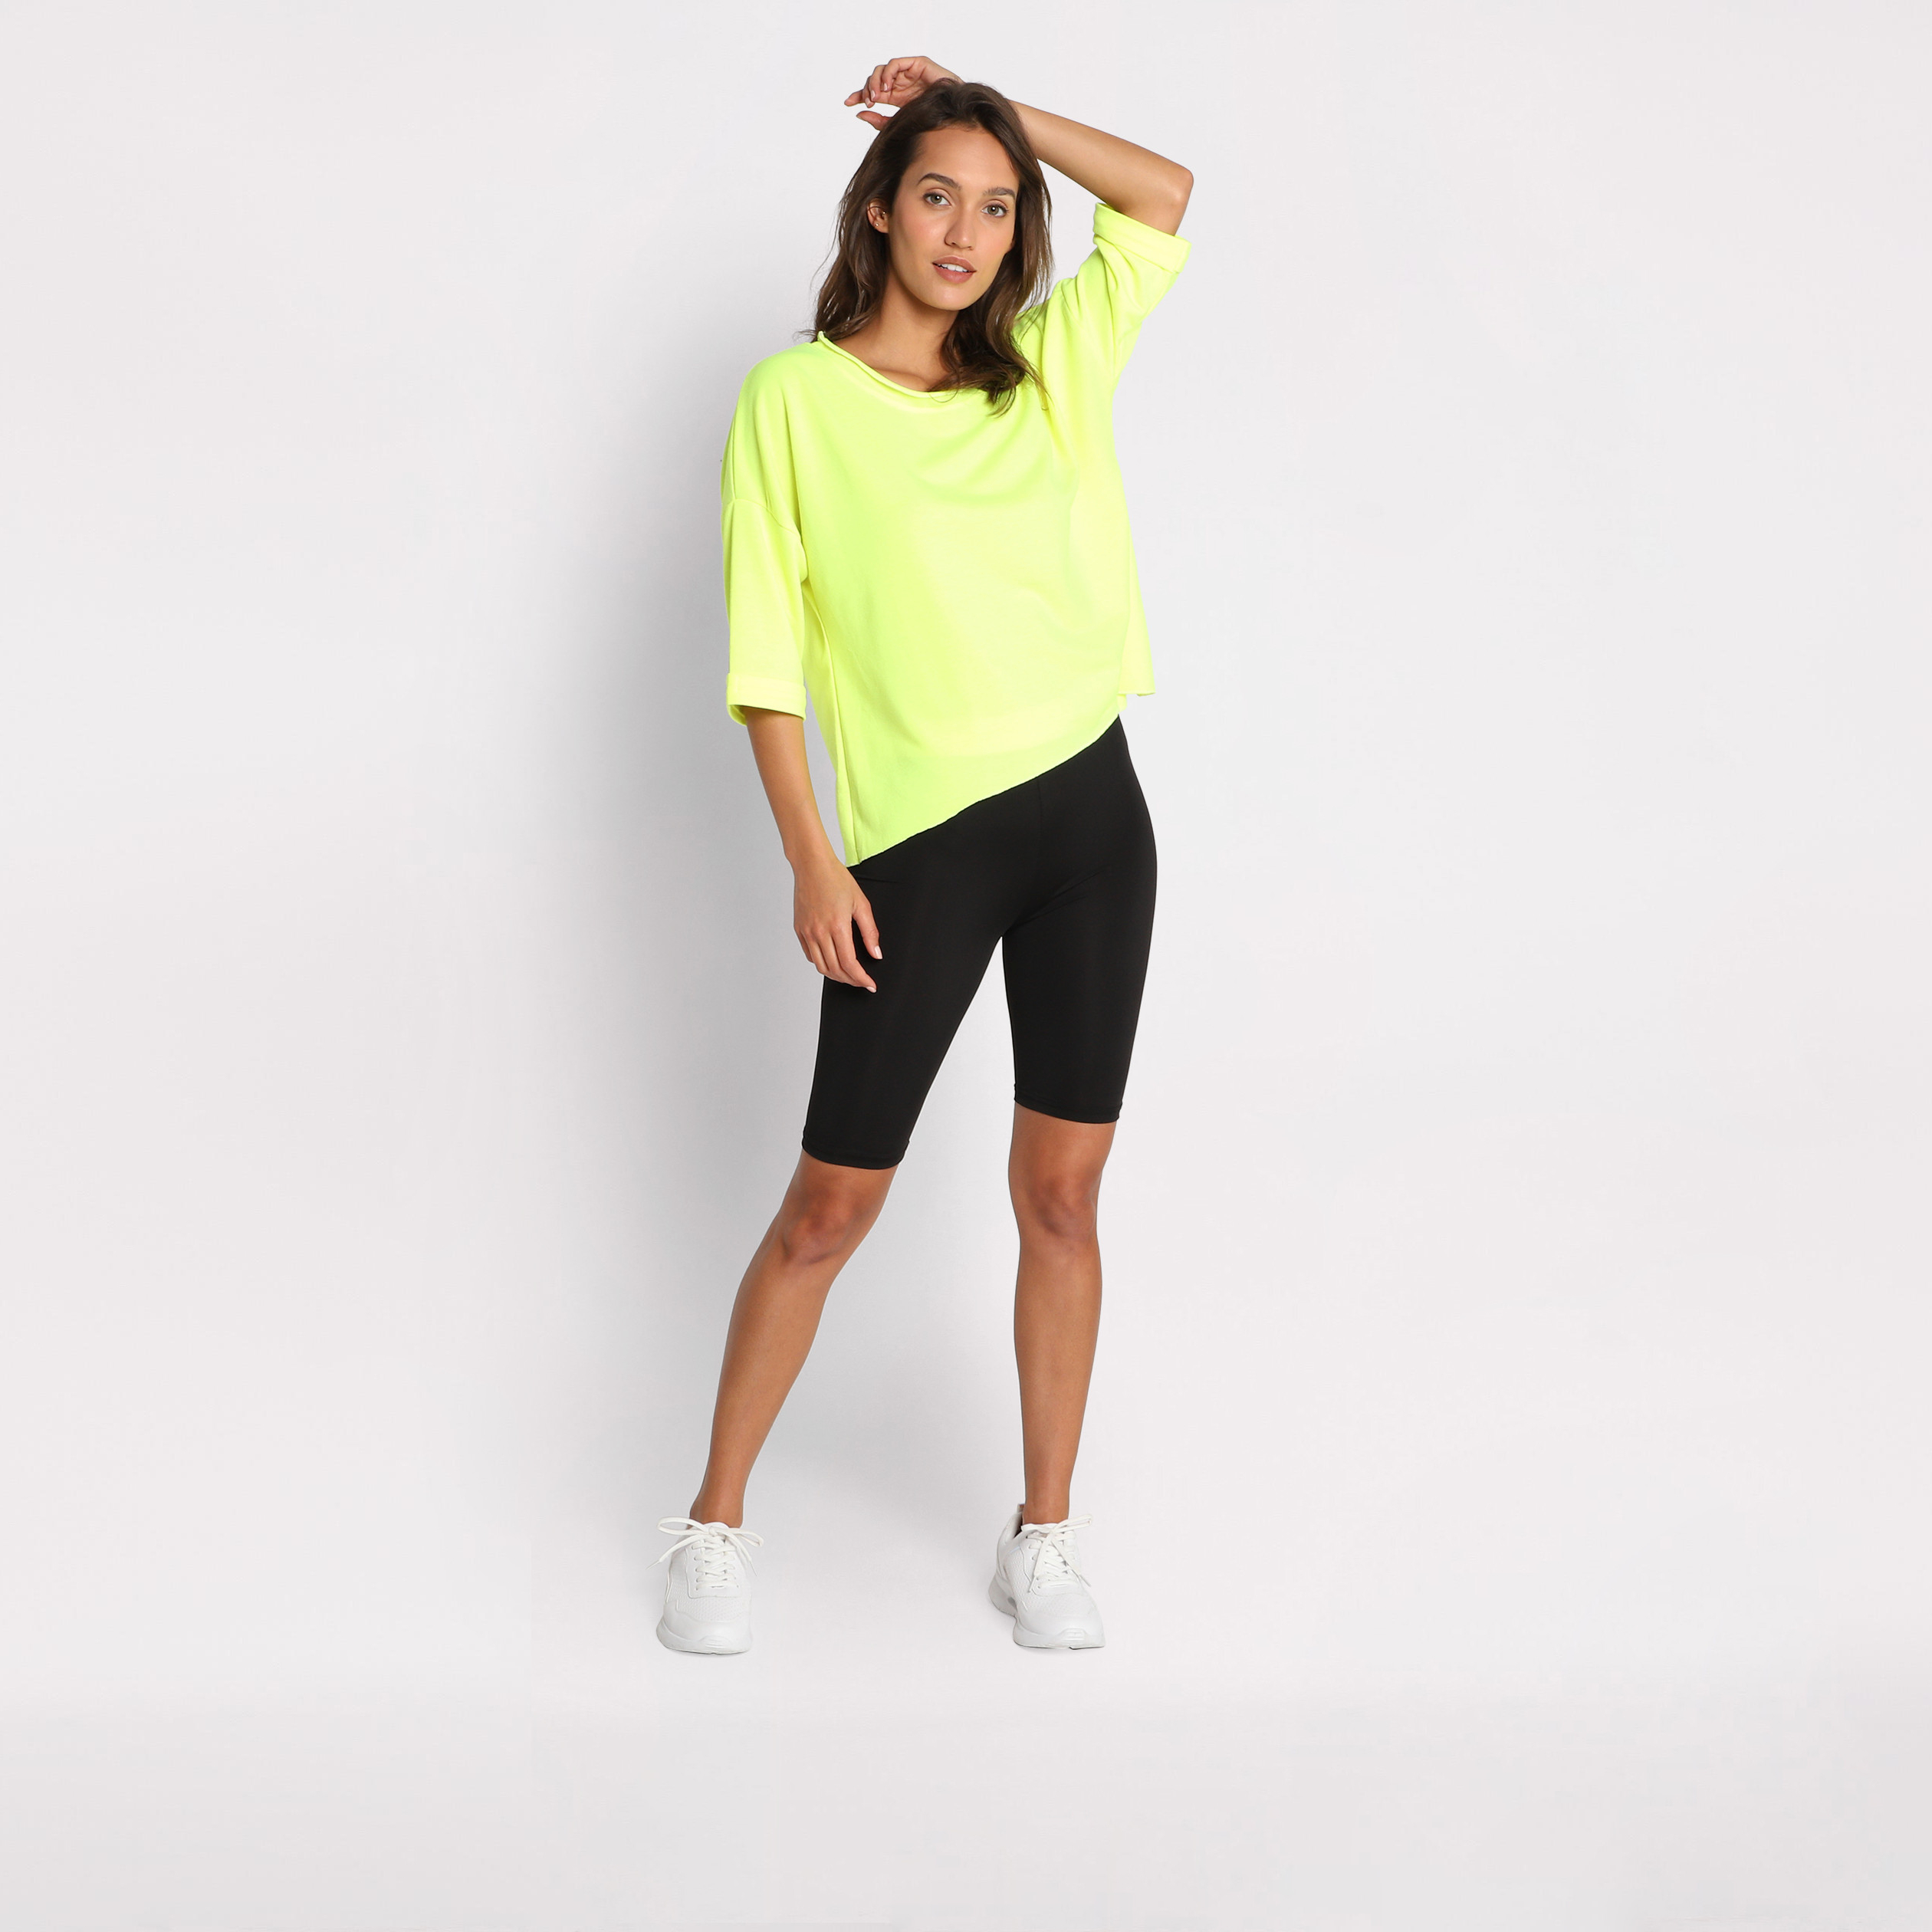 eb21bc346aec0 Short taille haute cycliste jaune femme